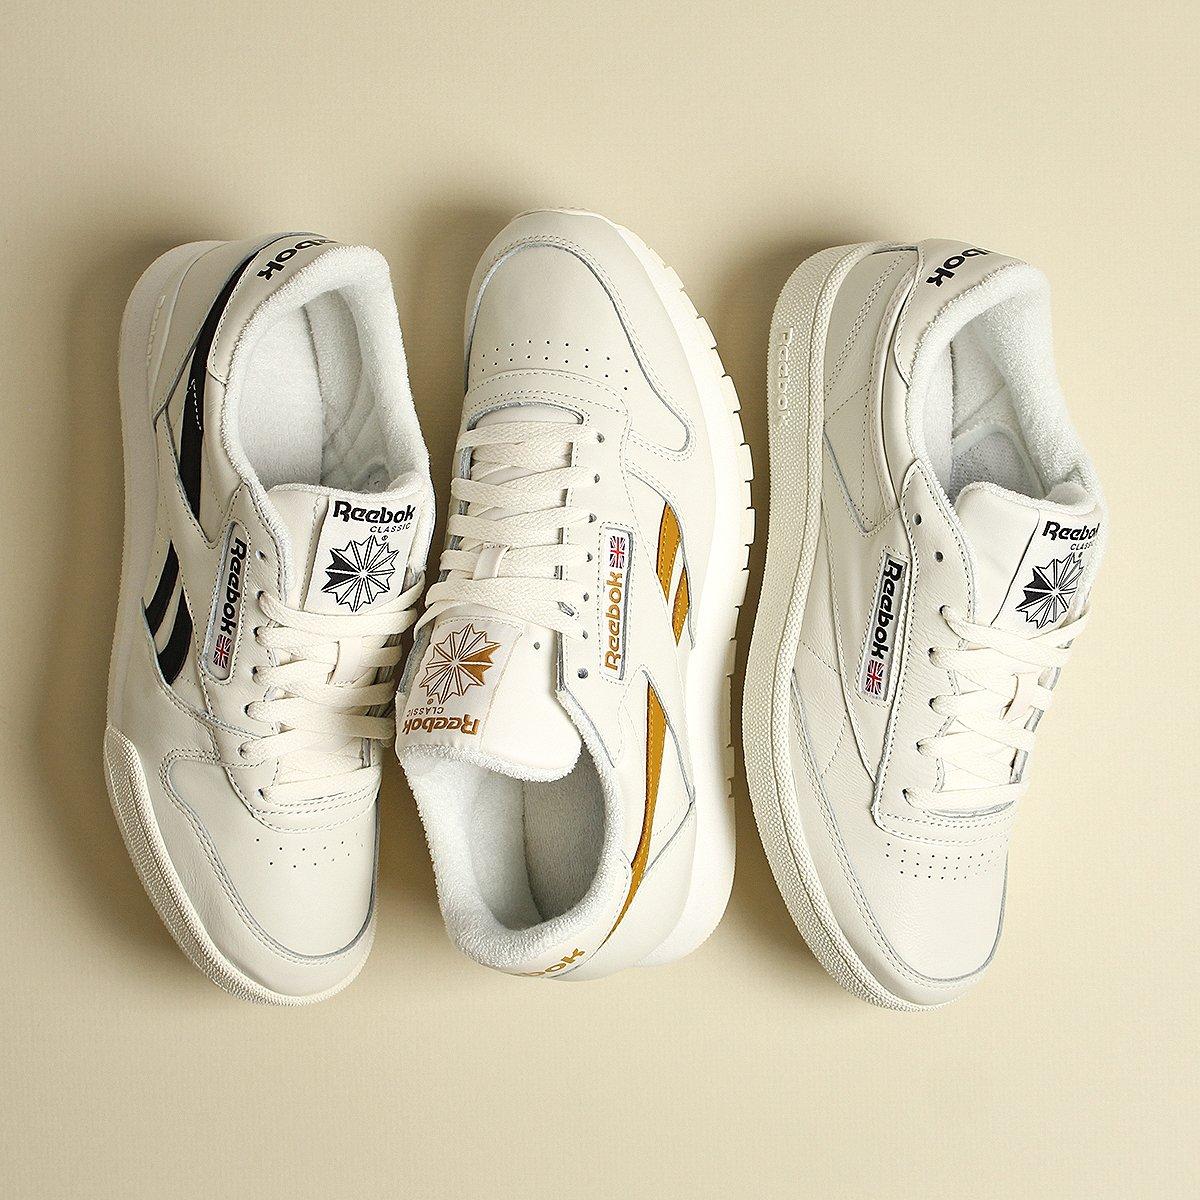 0090ec4133f reebok classic shoes hashtag on Twitter